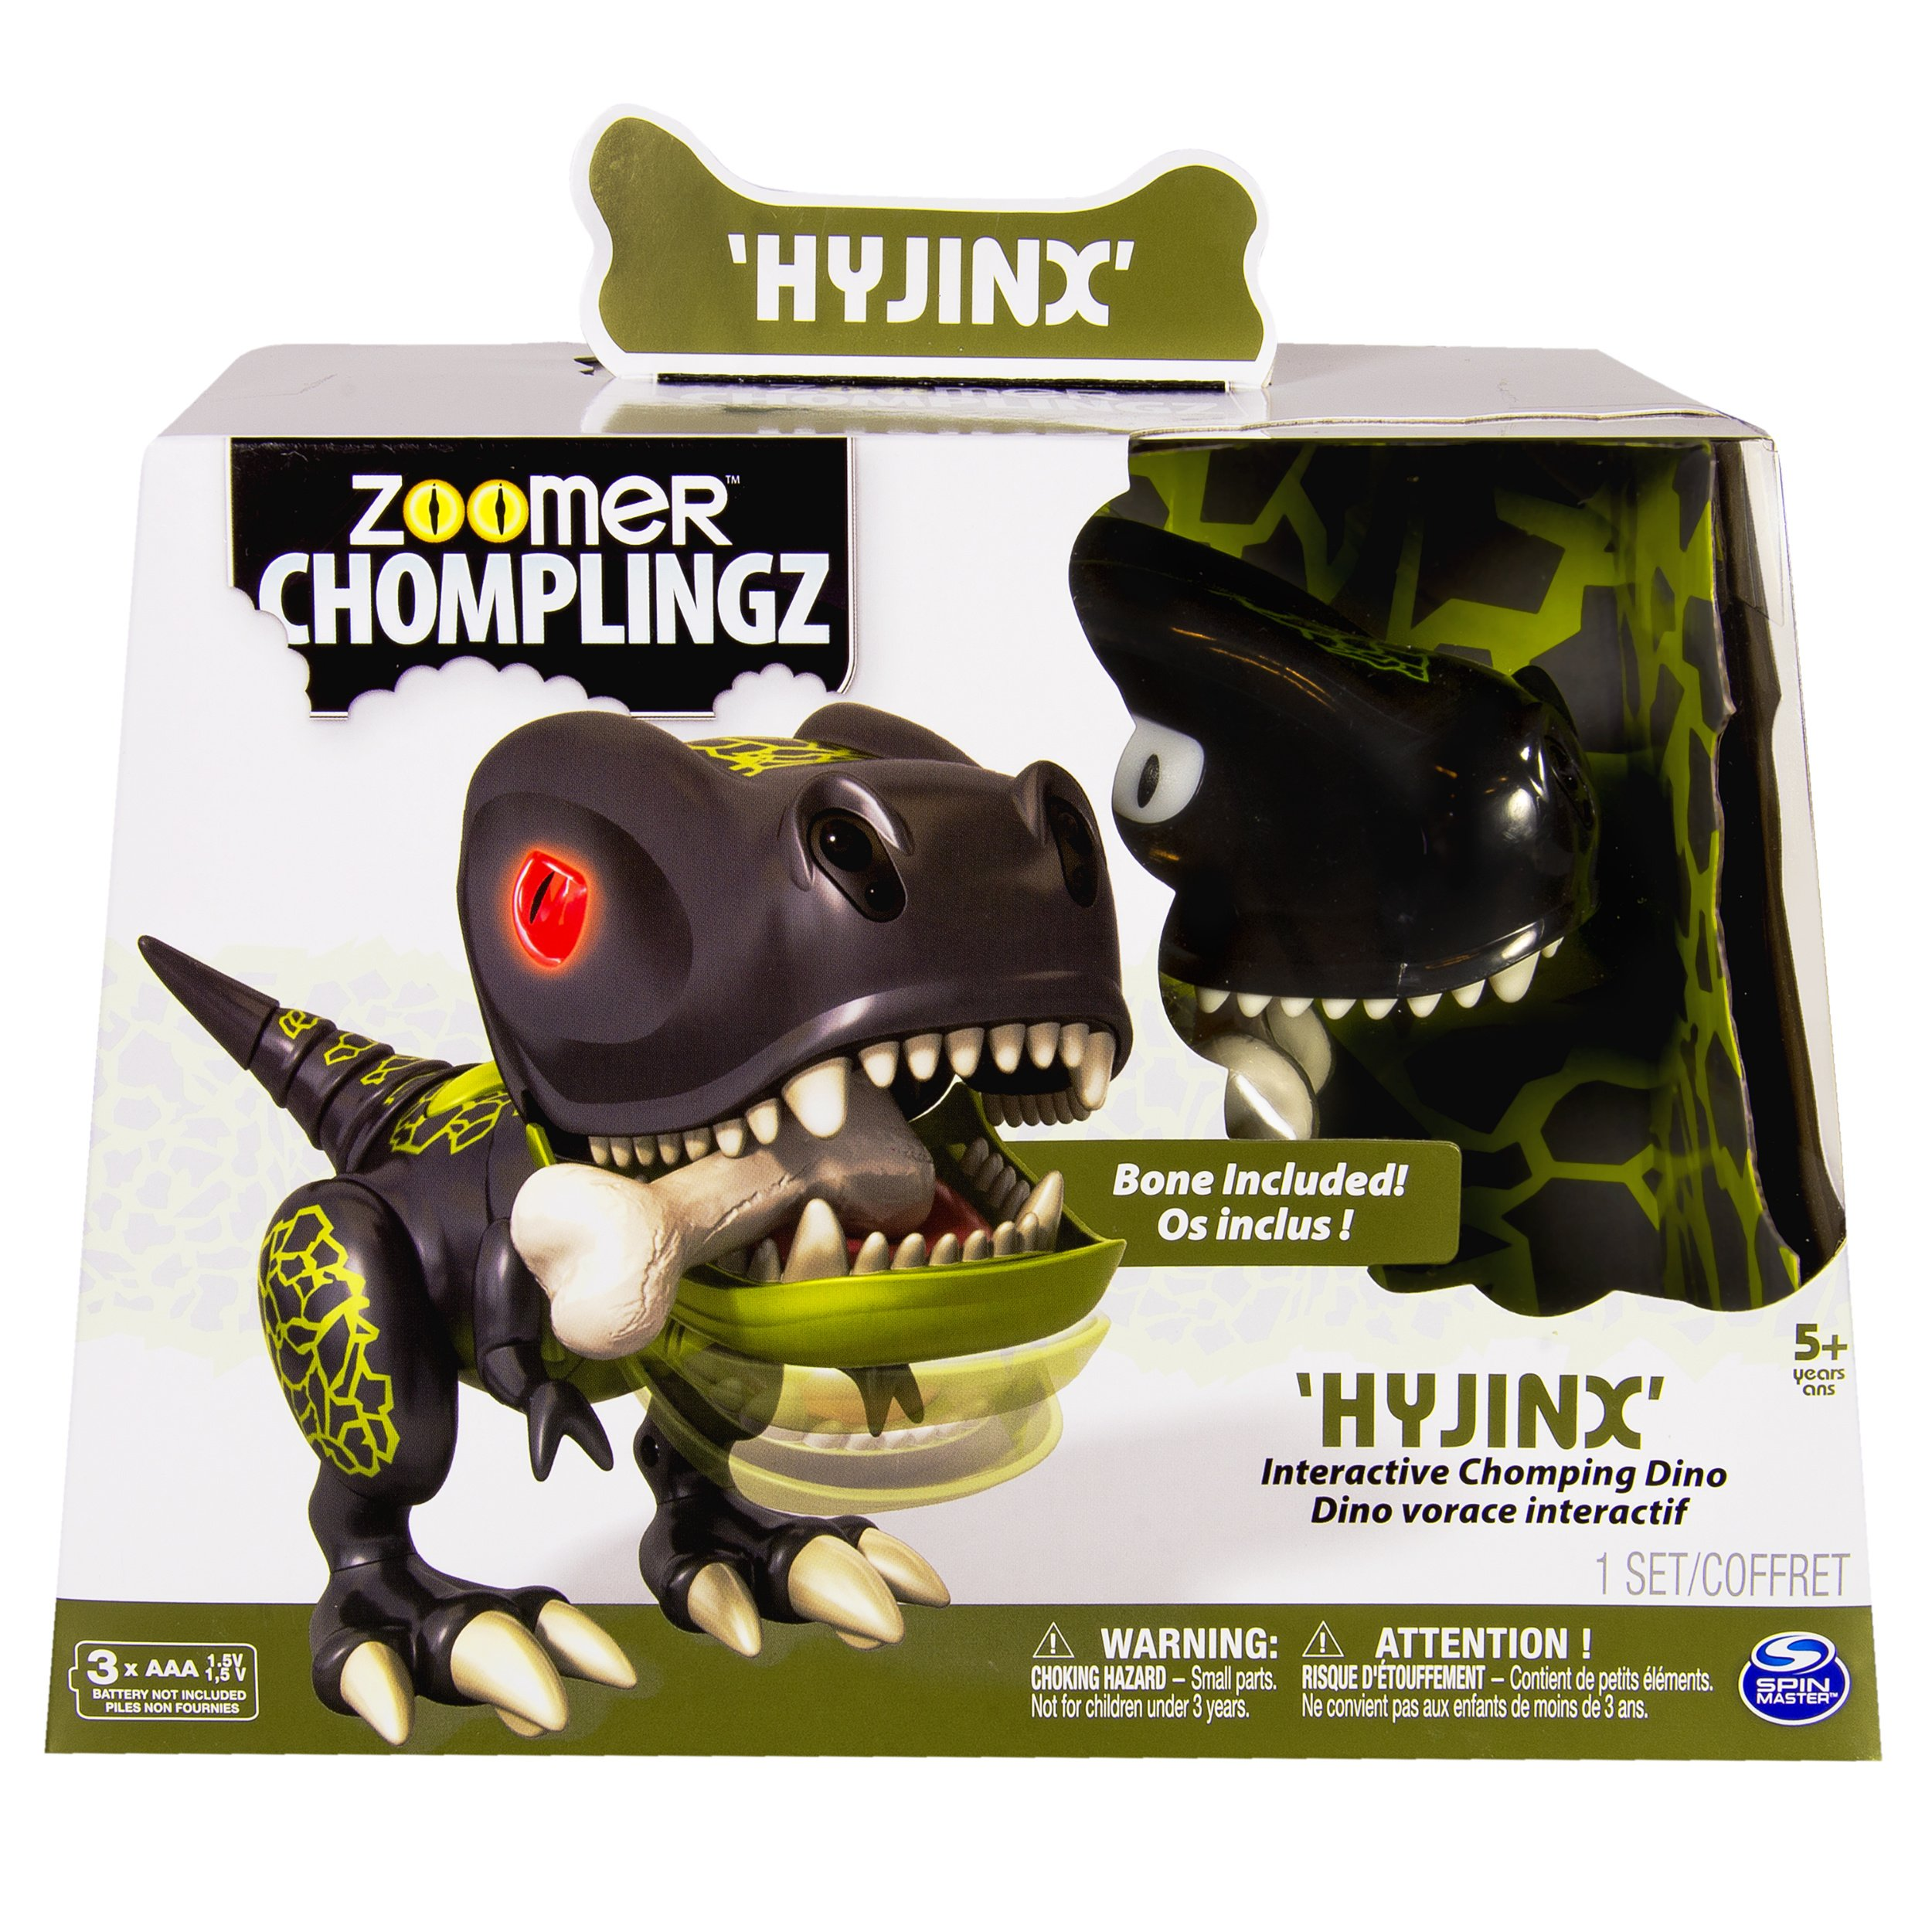 Zoomer Chomplingz - Hyjinx Interactive Dinosaur by Zoomer (Image #2)